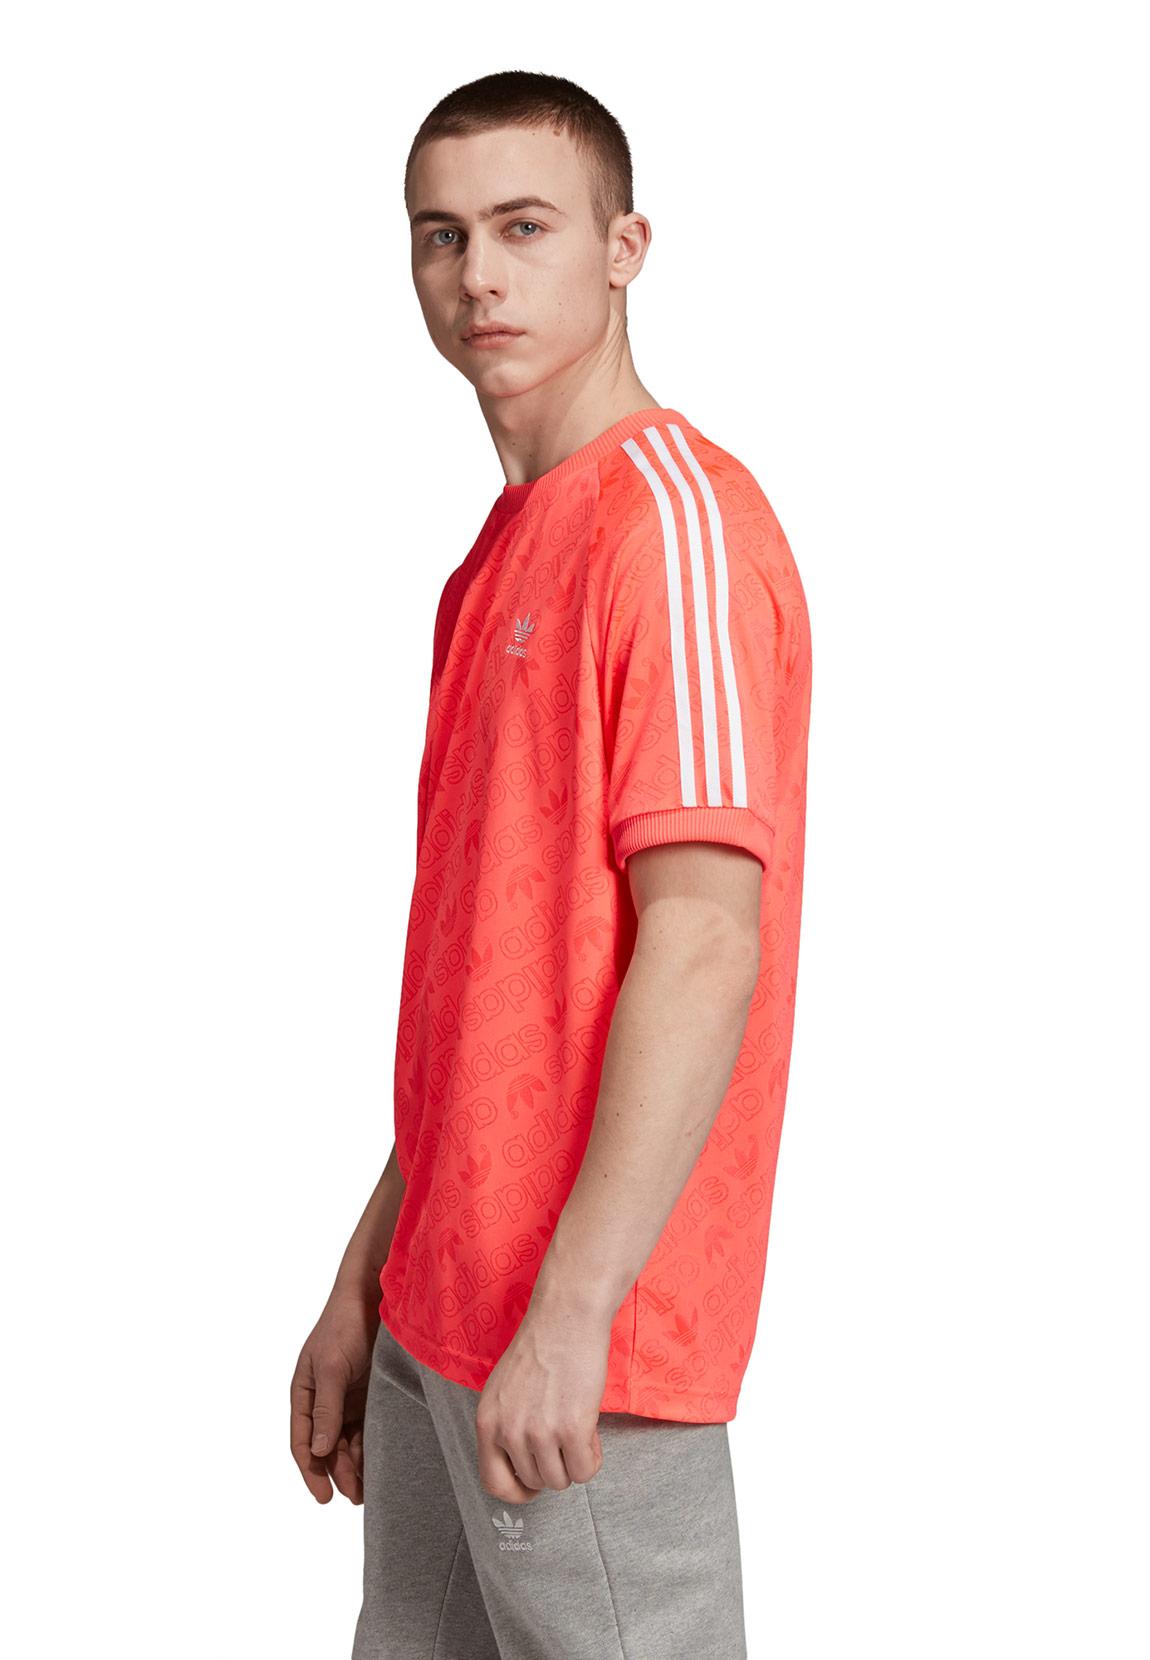 Adidas Originals T Shirt Herren MONO JERSEY ED7039 Rot Lachs